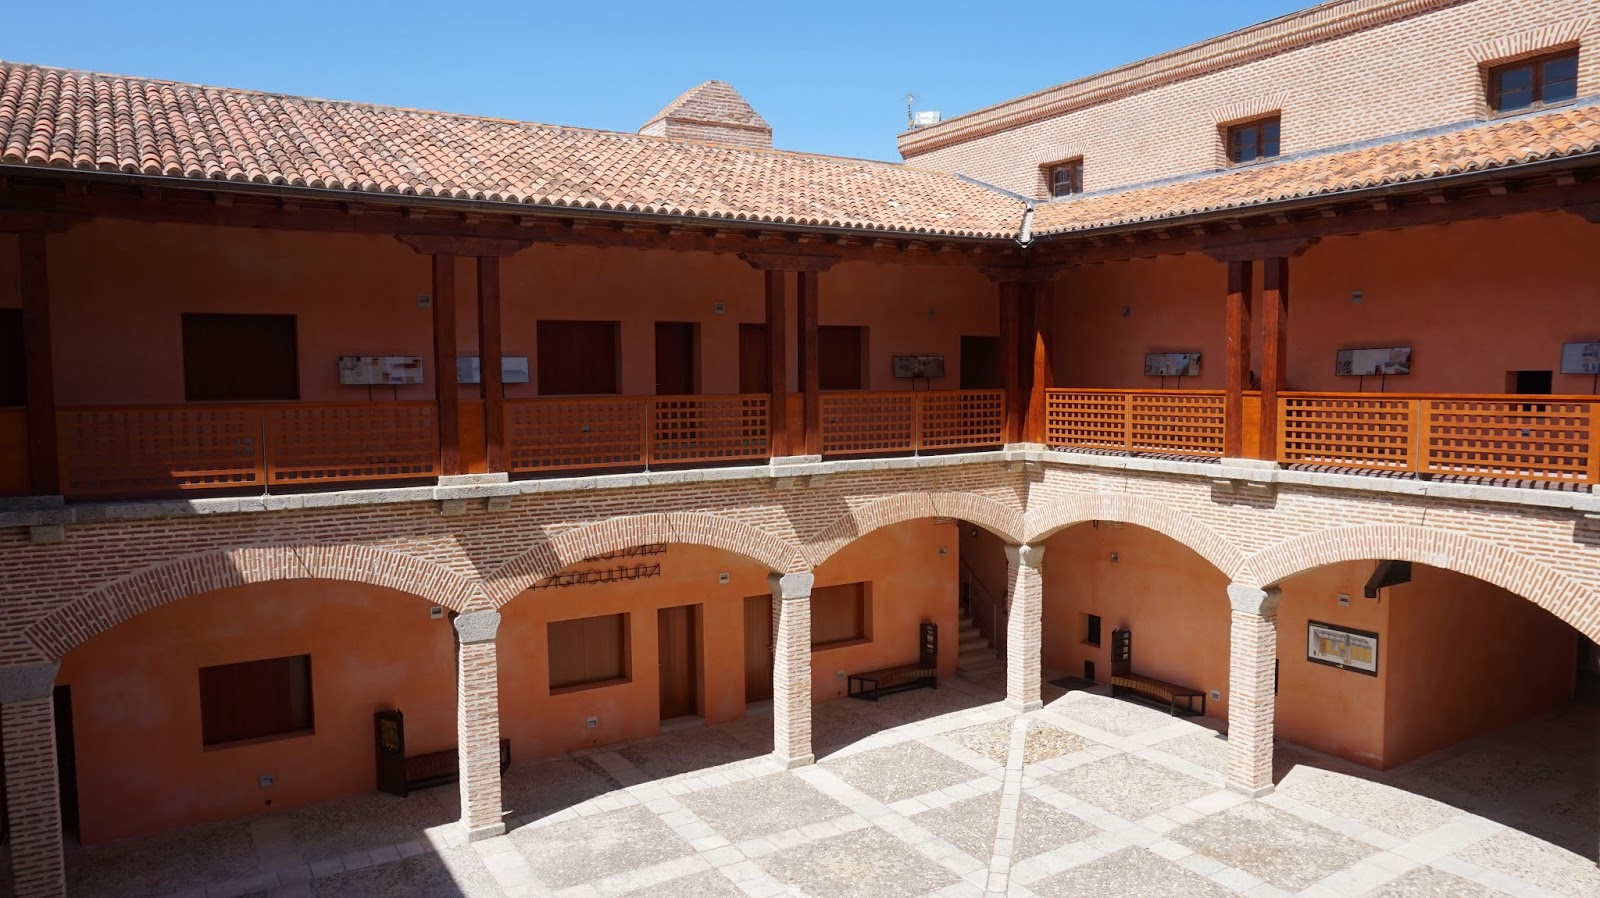 Primer patio del castillo de Arévalo